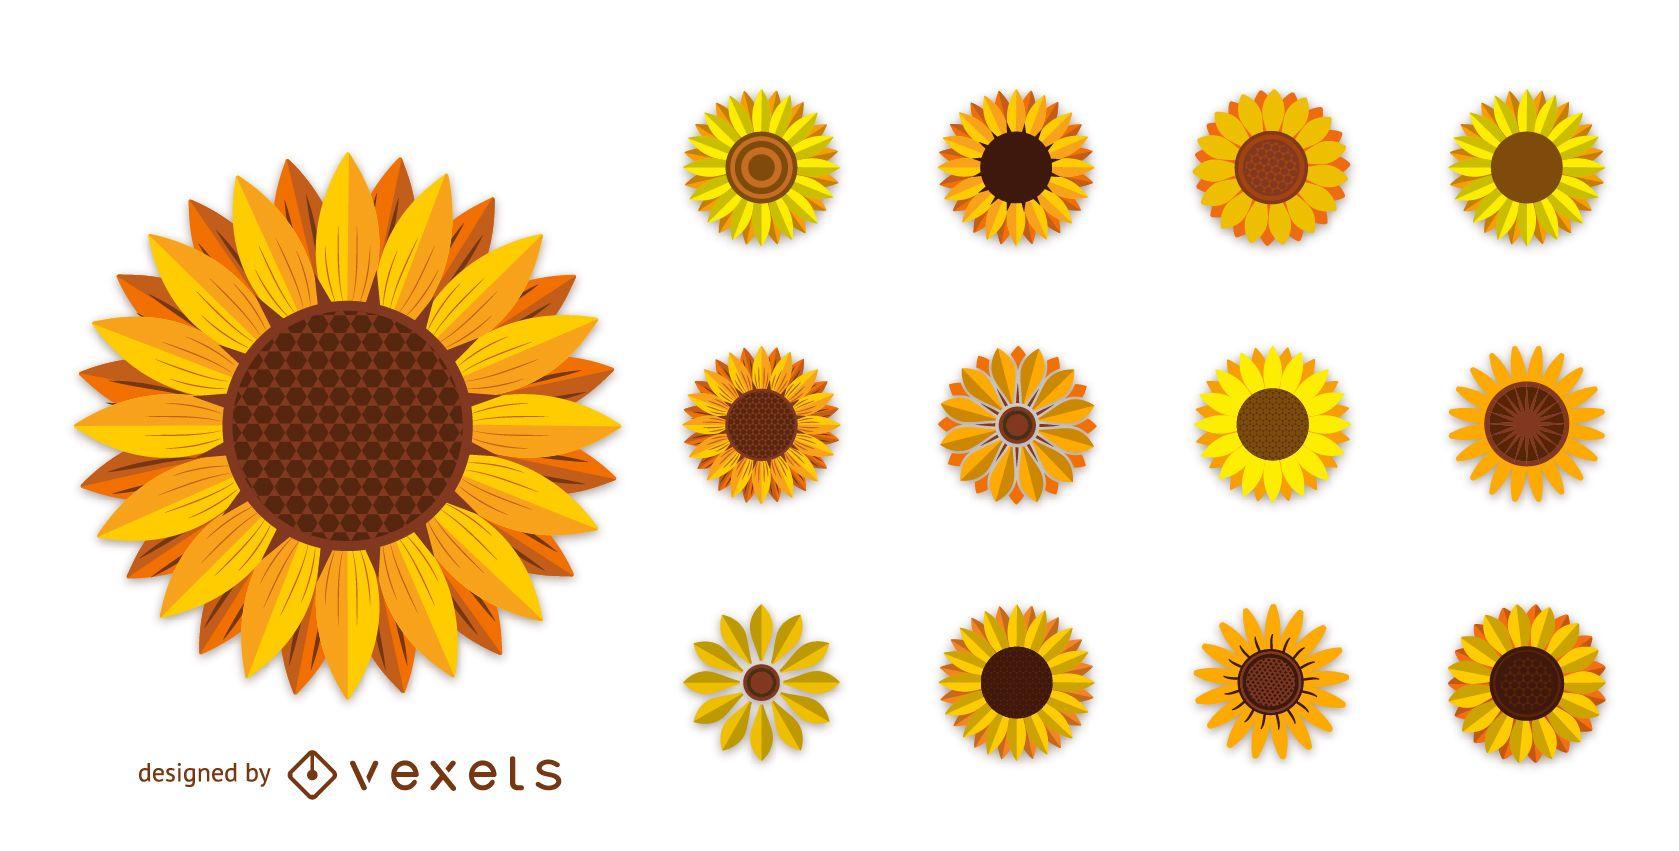 Set of sunflower illustrations